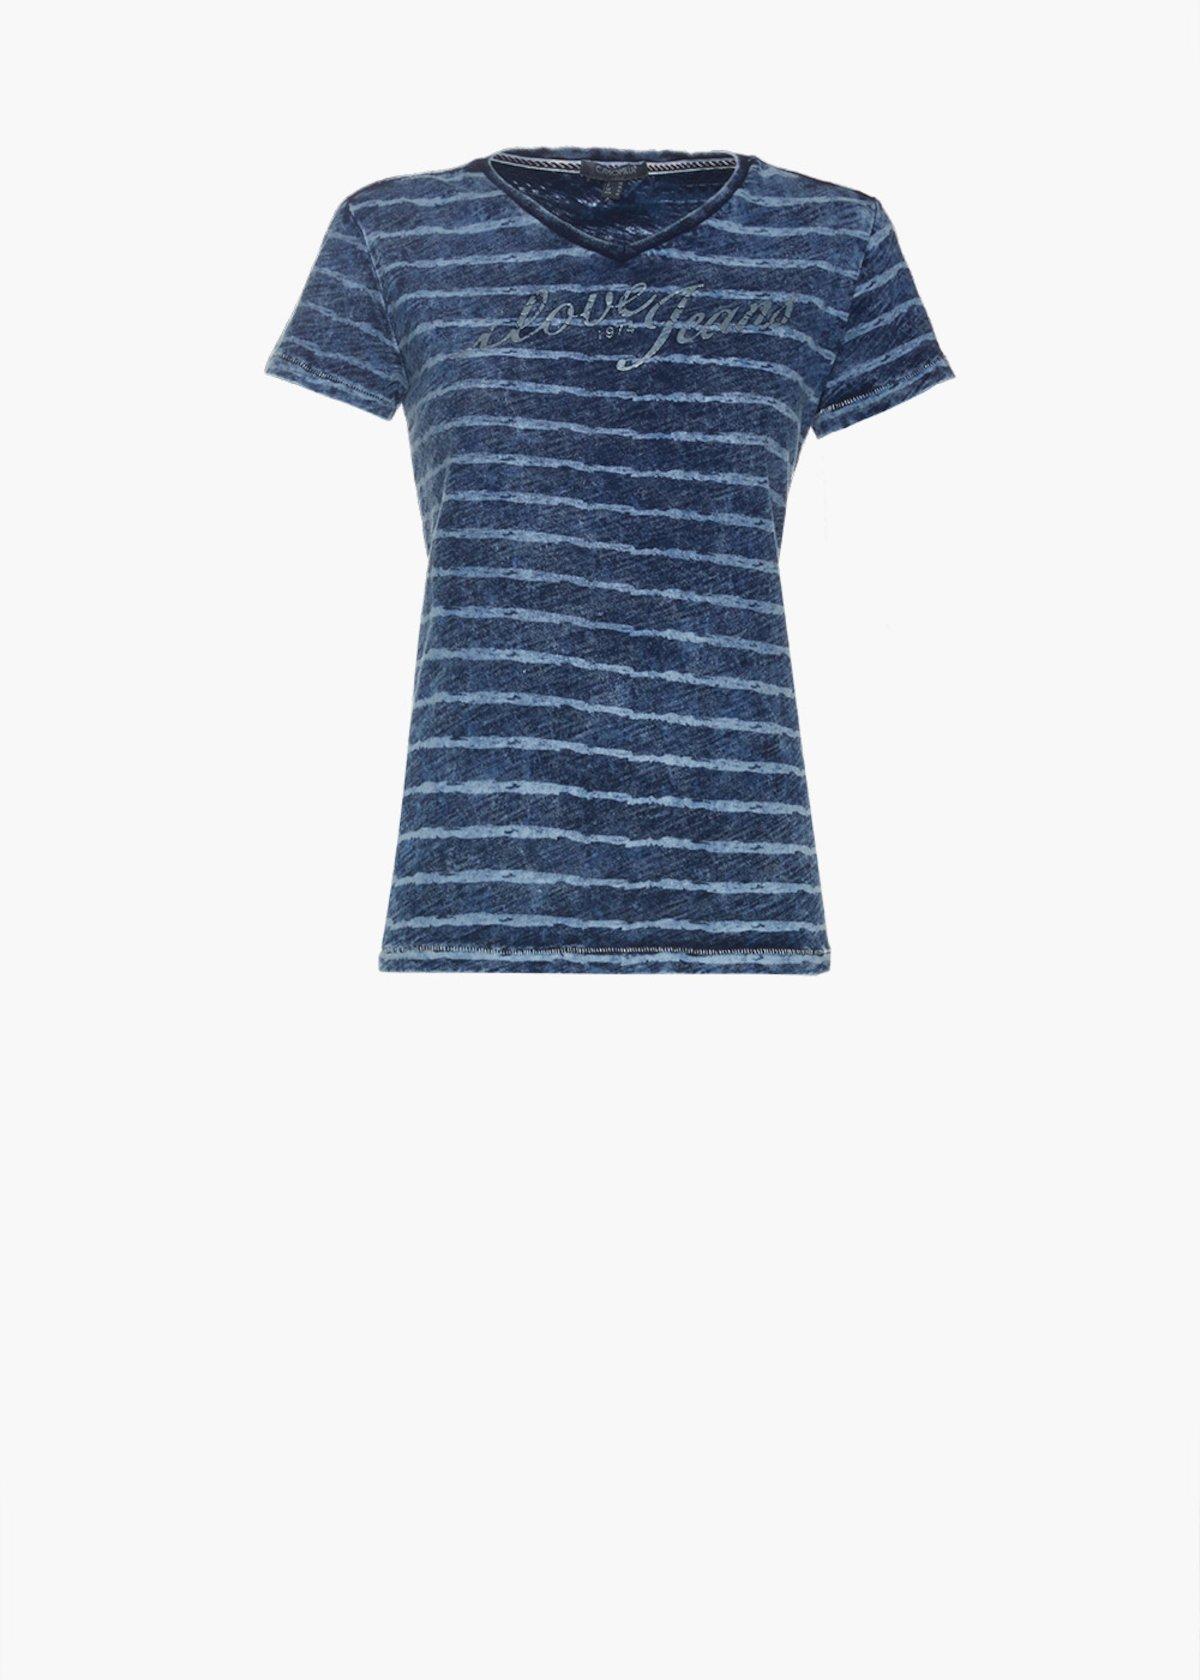 Sallyn t-shirt with striped print - Blue / White Stripes - Woman